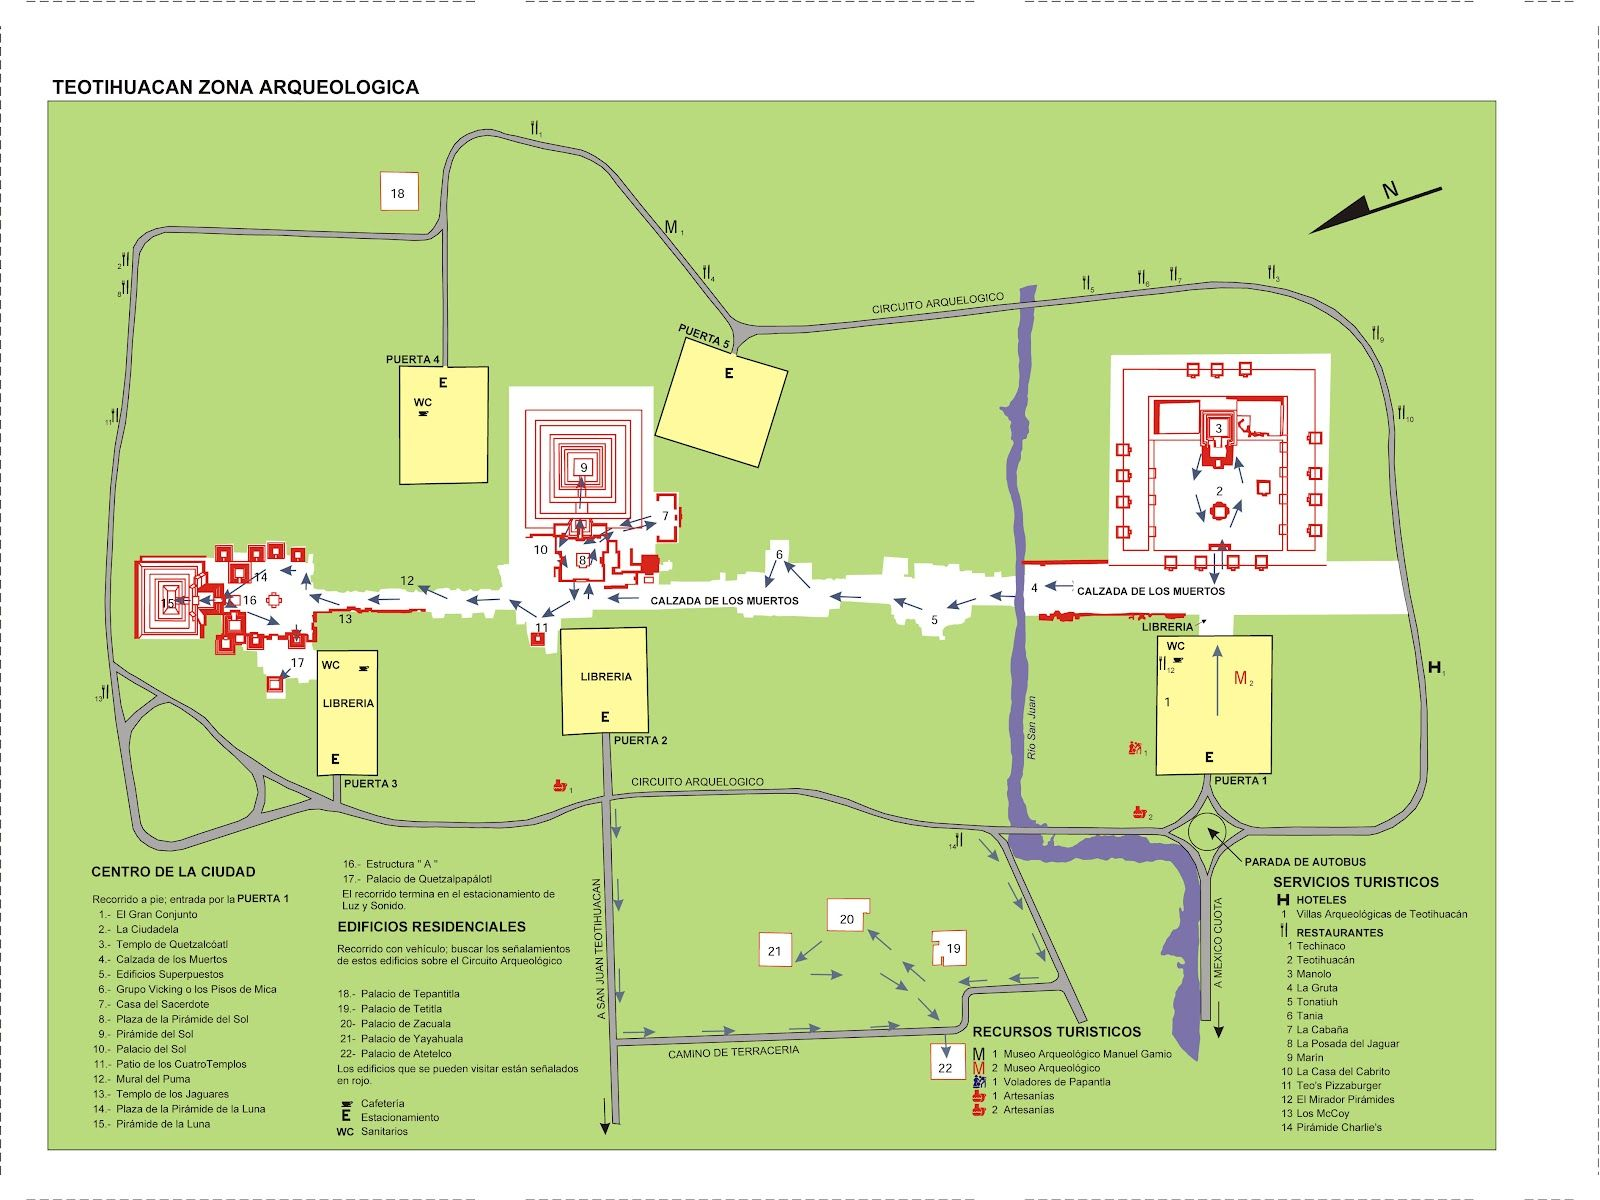 Mapa das Pirâmides de Teotihuacan